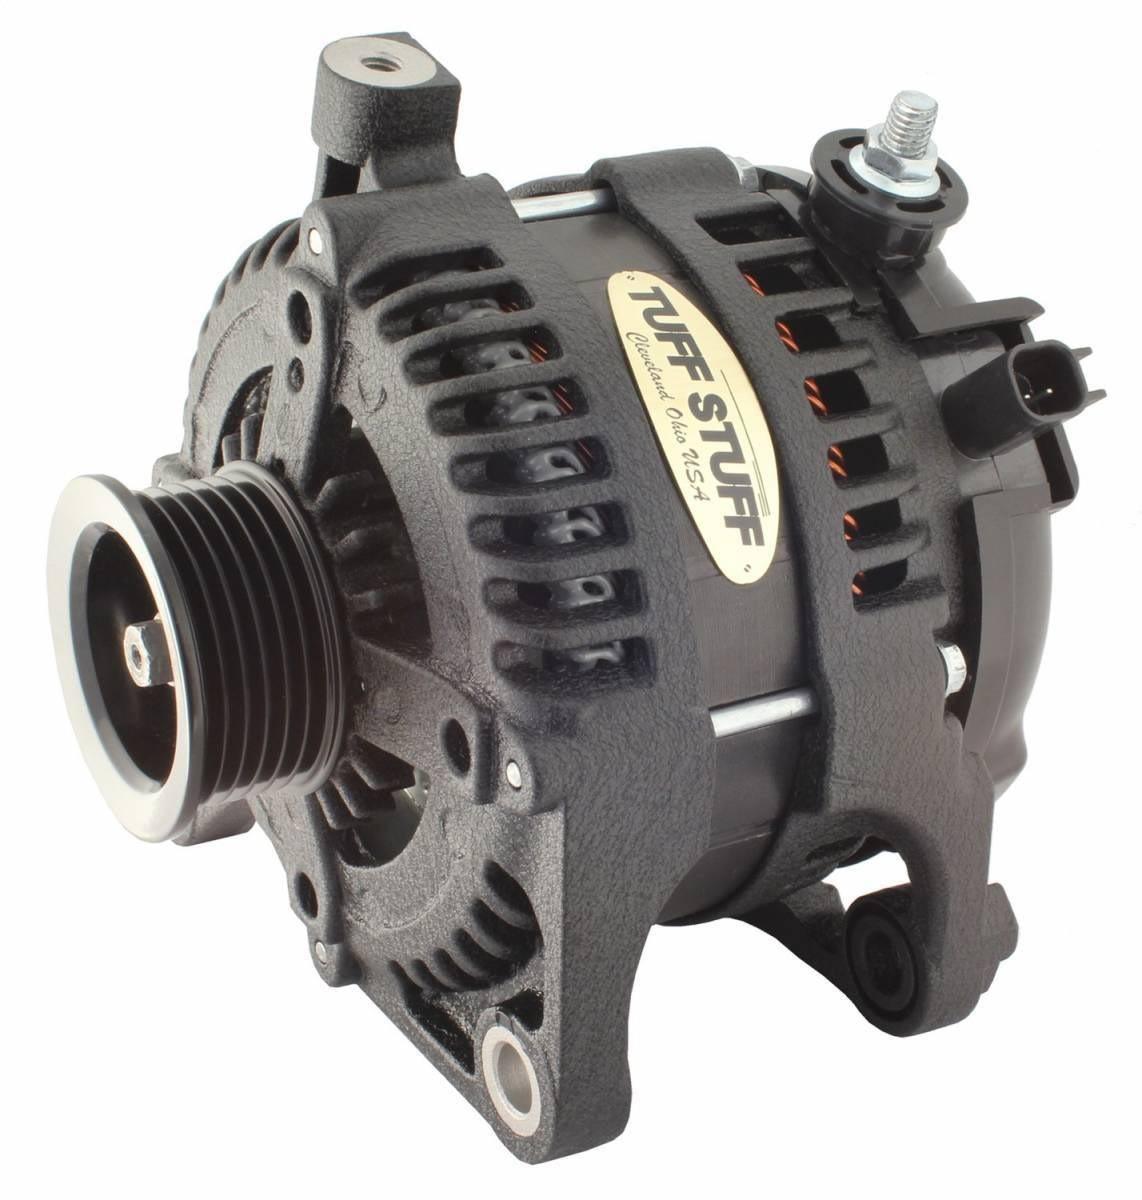 Tuff-Stuff 7515B Alternator, 250 amp, 12V, External Regulator, 6 Rib Serpentine Pulley, Black Wrinkle, Jeep Wrangler JK 2007-11, Each